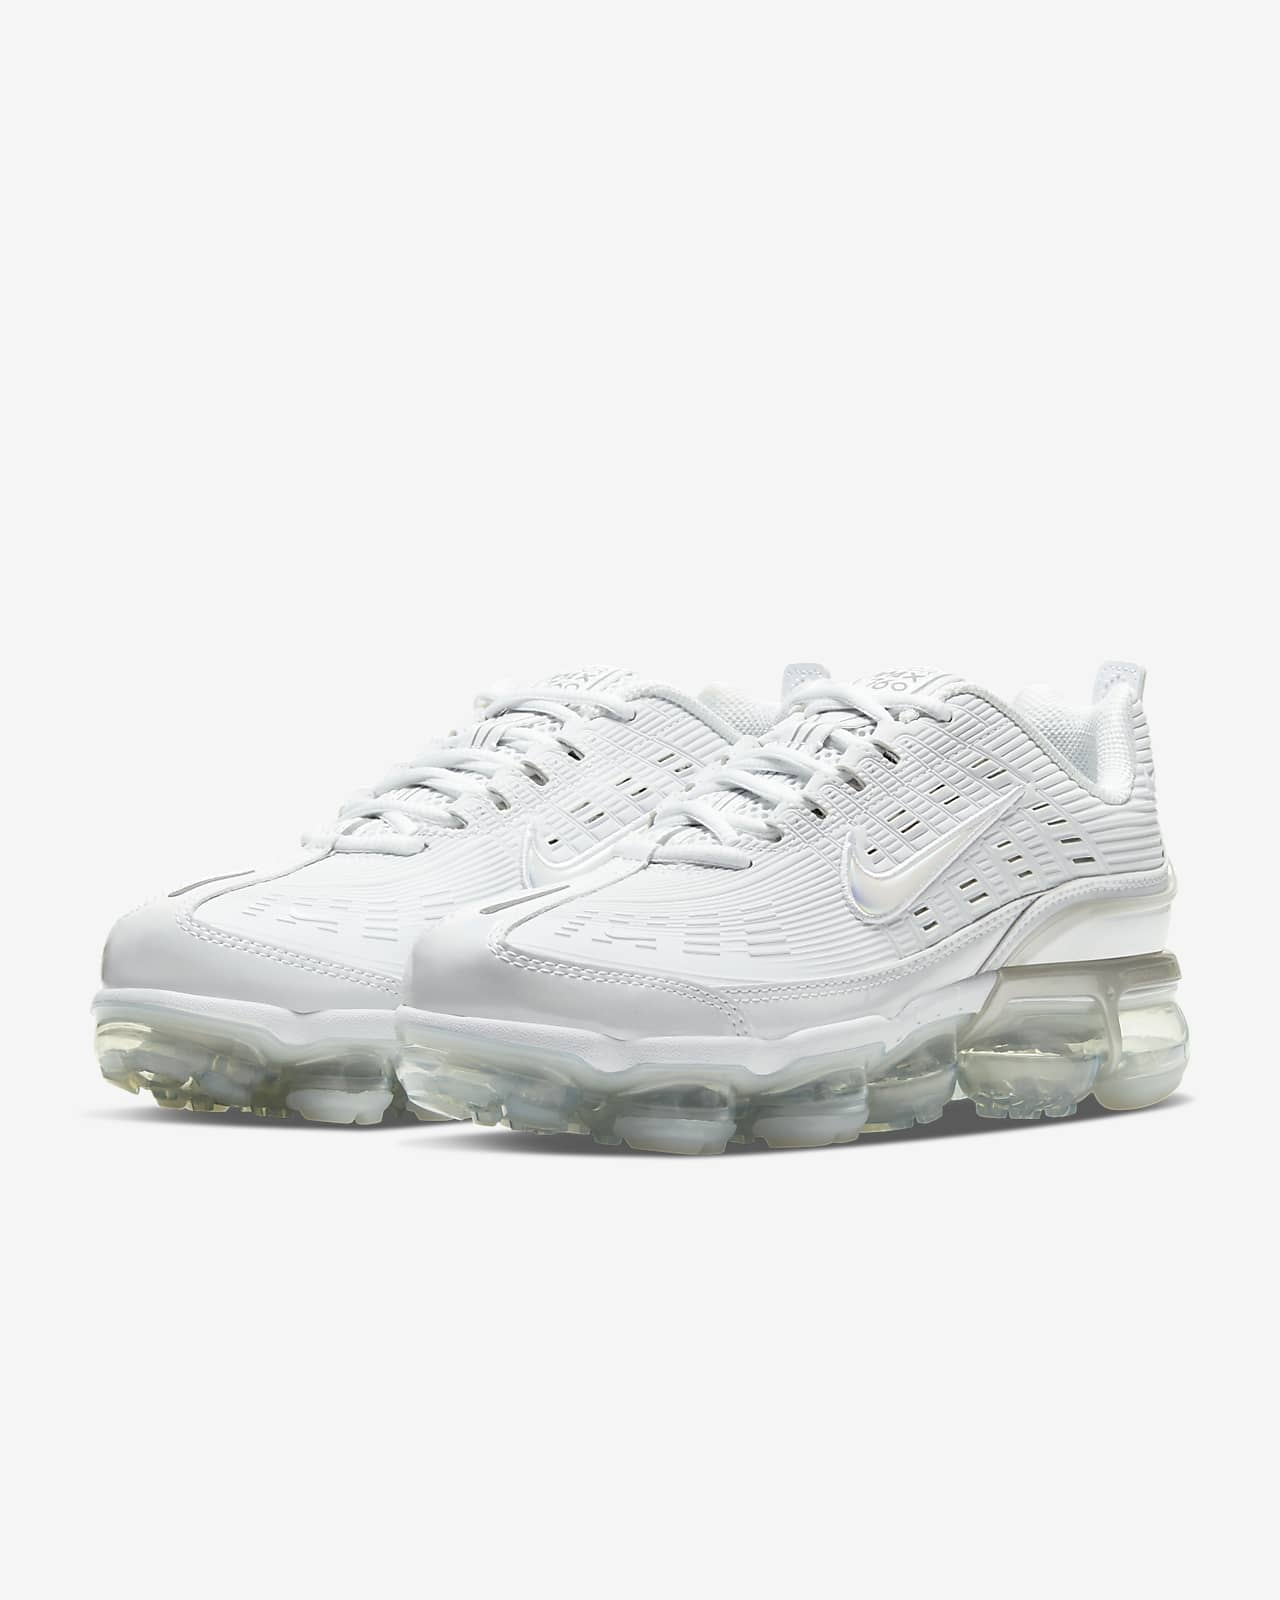 Chaussure Nike Air Vapormax 360 pour Femme